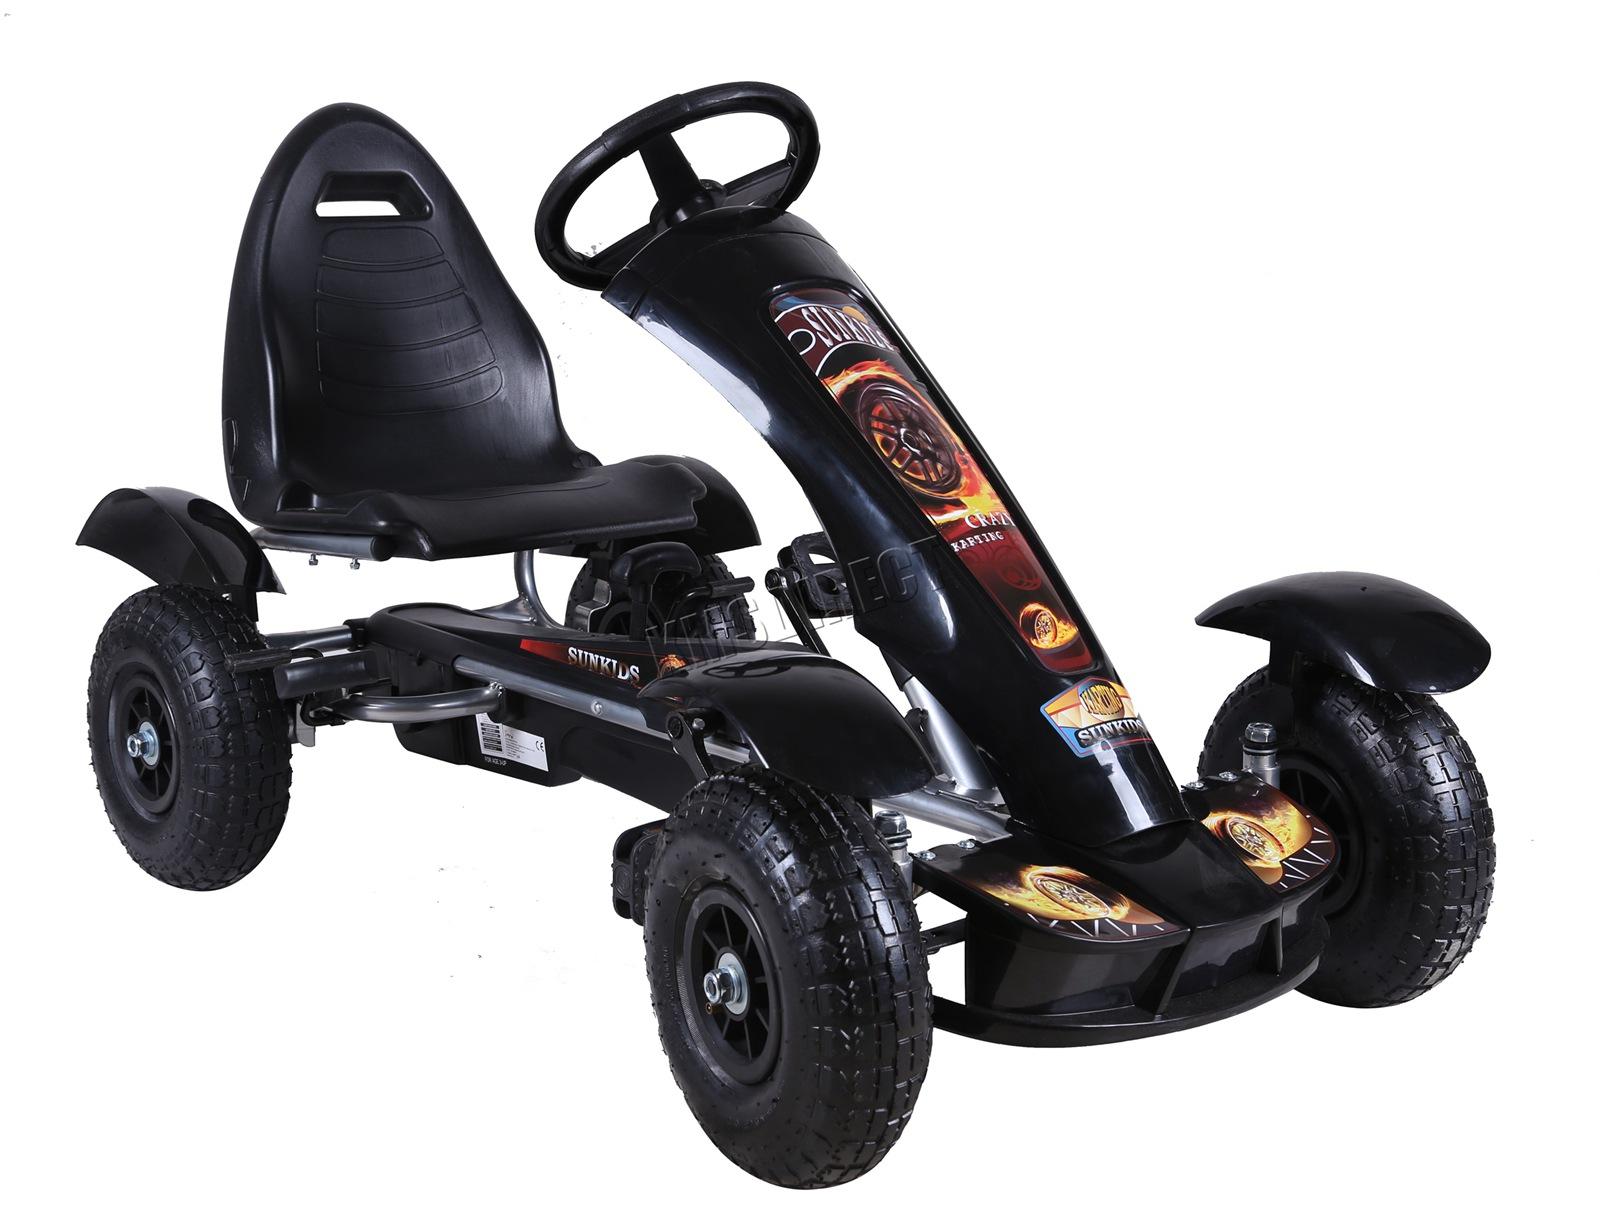 201701719267 2475 I 305 25 GOKART FH G03 BLACK KMSWM055 - Foxhunter Infantil Go Kart – Pedal Coche para Niños Gocart con Freno de Mano G03